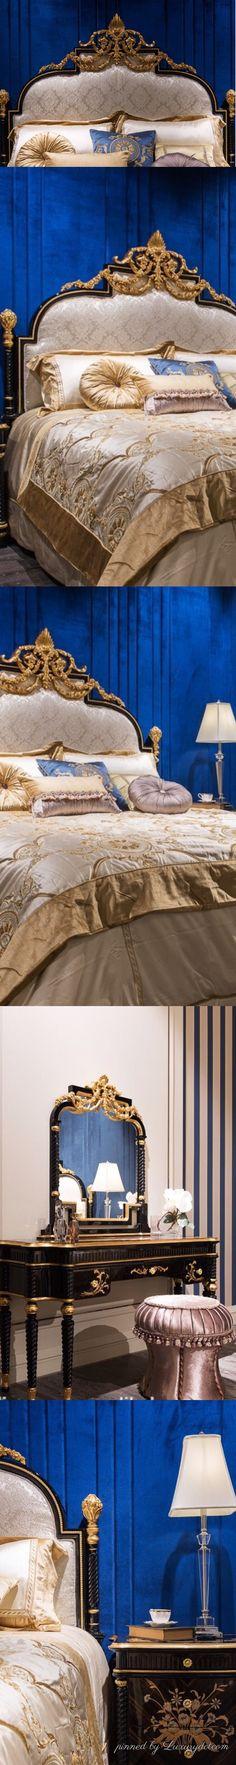 #Luxury bedrooms #Luxurydotcom